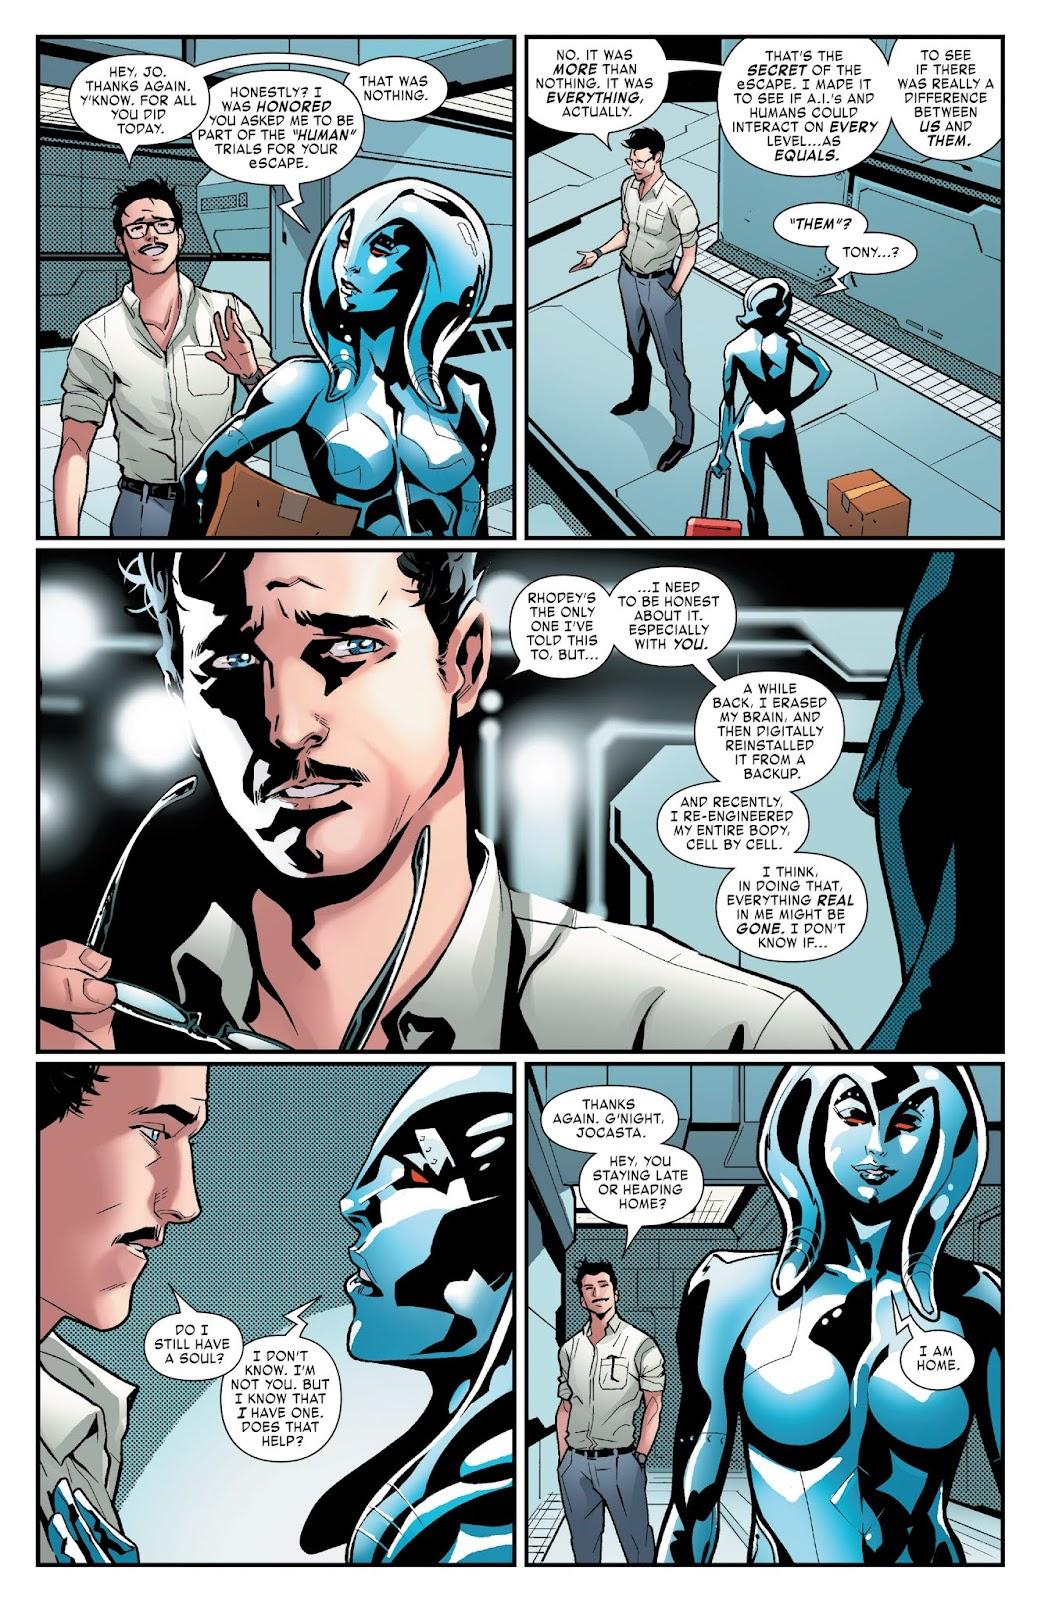 Read online Tony Stark: Iron Man comic -  Issue #3 - 20